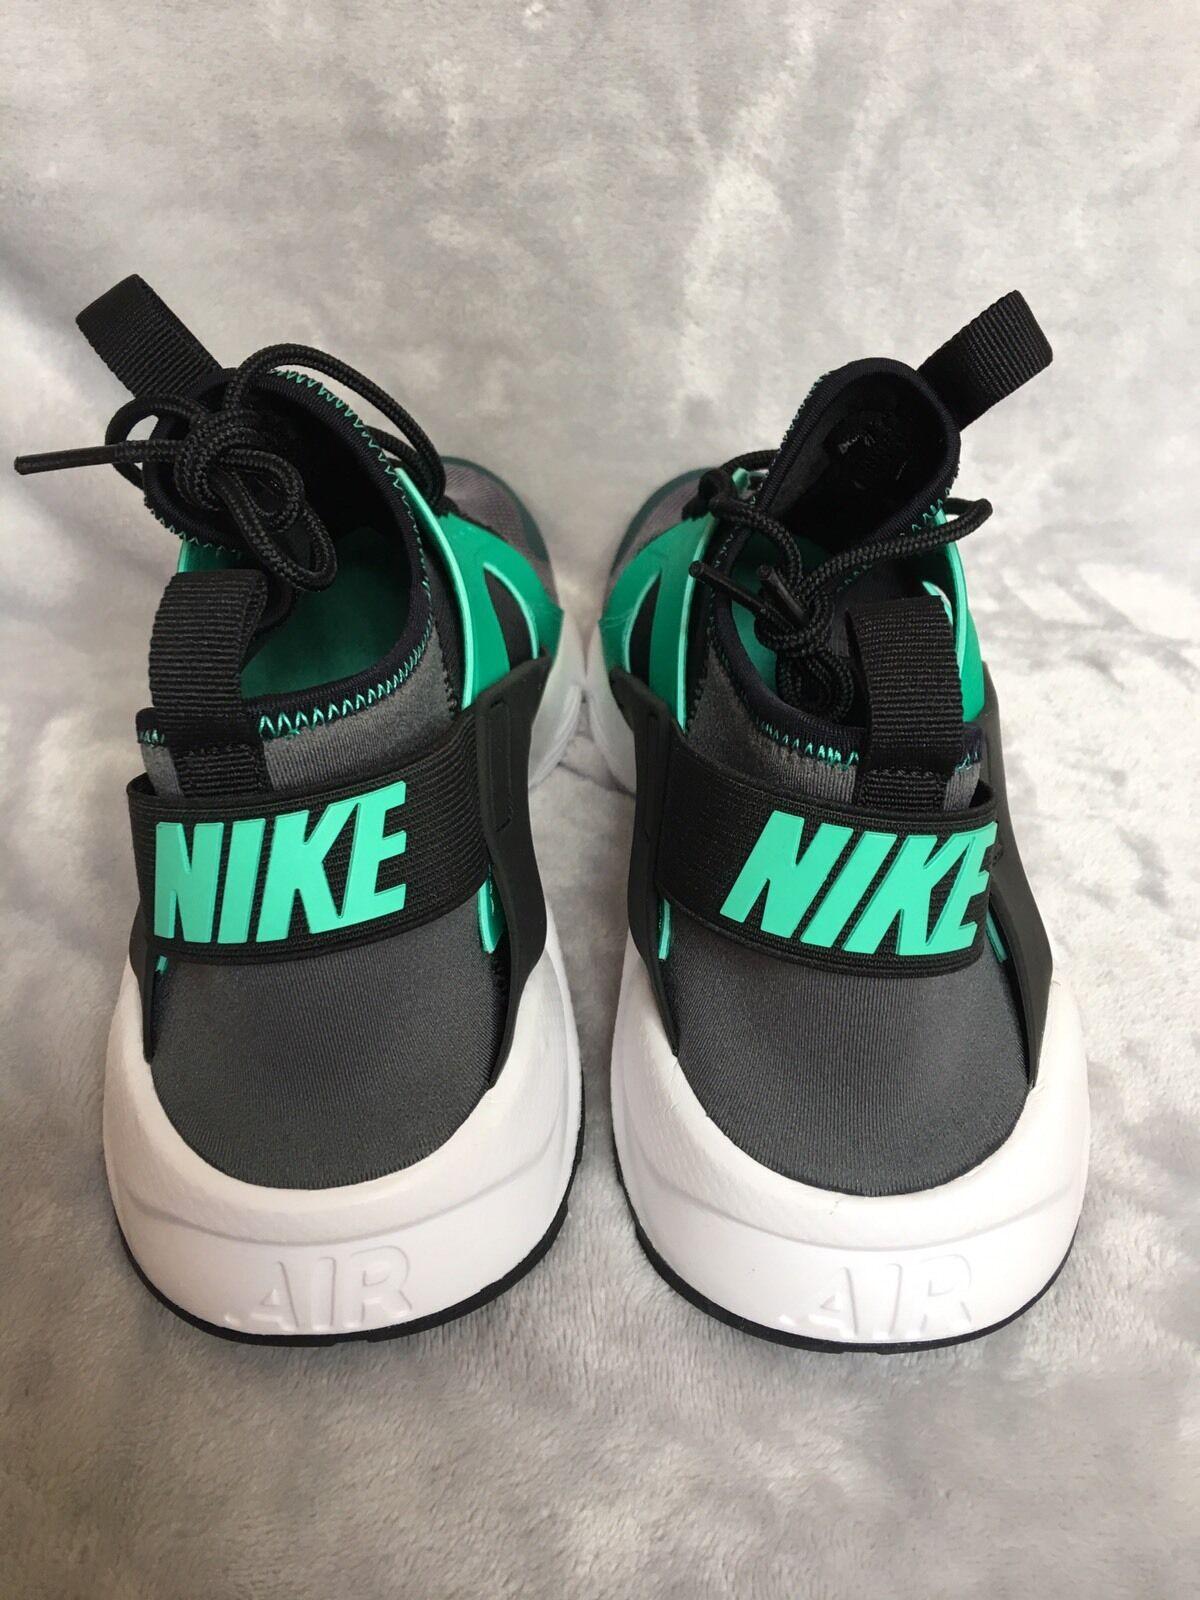 check out aaccf 55cdc ... Nike Air Huarache Running Shoes Training Green Black 819685 819685  819685 003 Mens Size 13 c9e85e ...